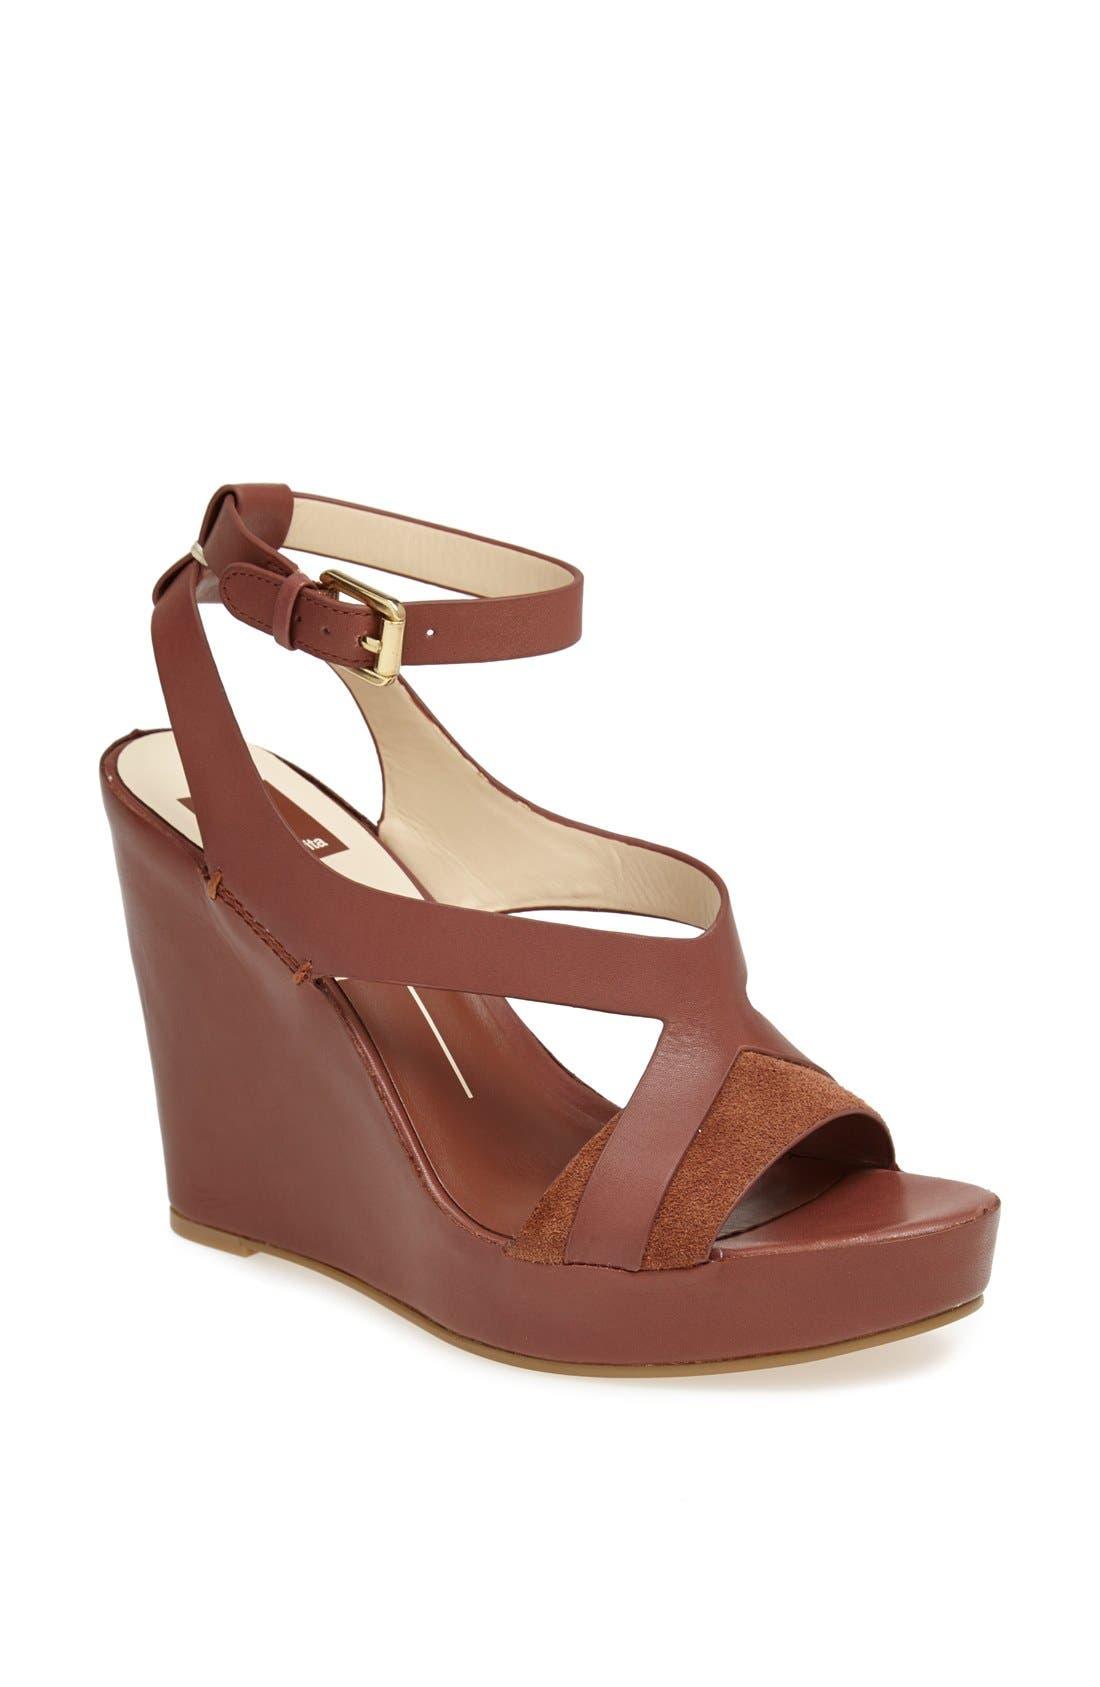 Alternate Image 1 Selected - Dolce Vita 'Berit' Platform Sandal